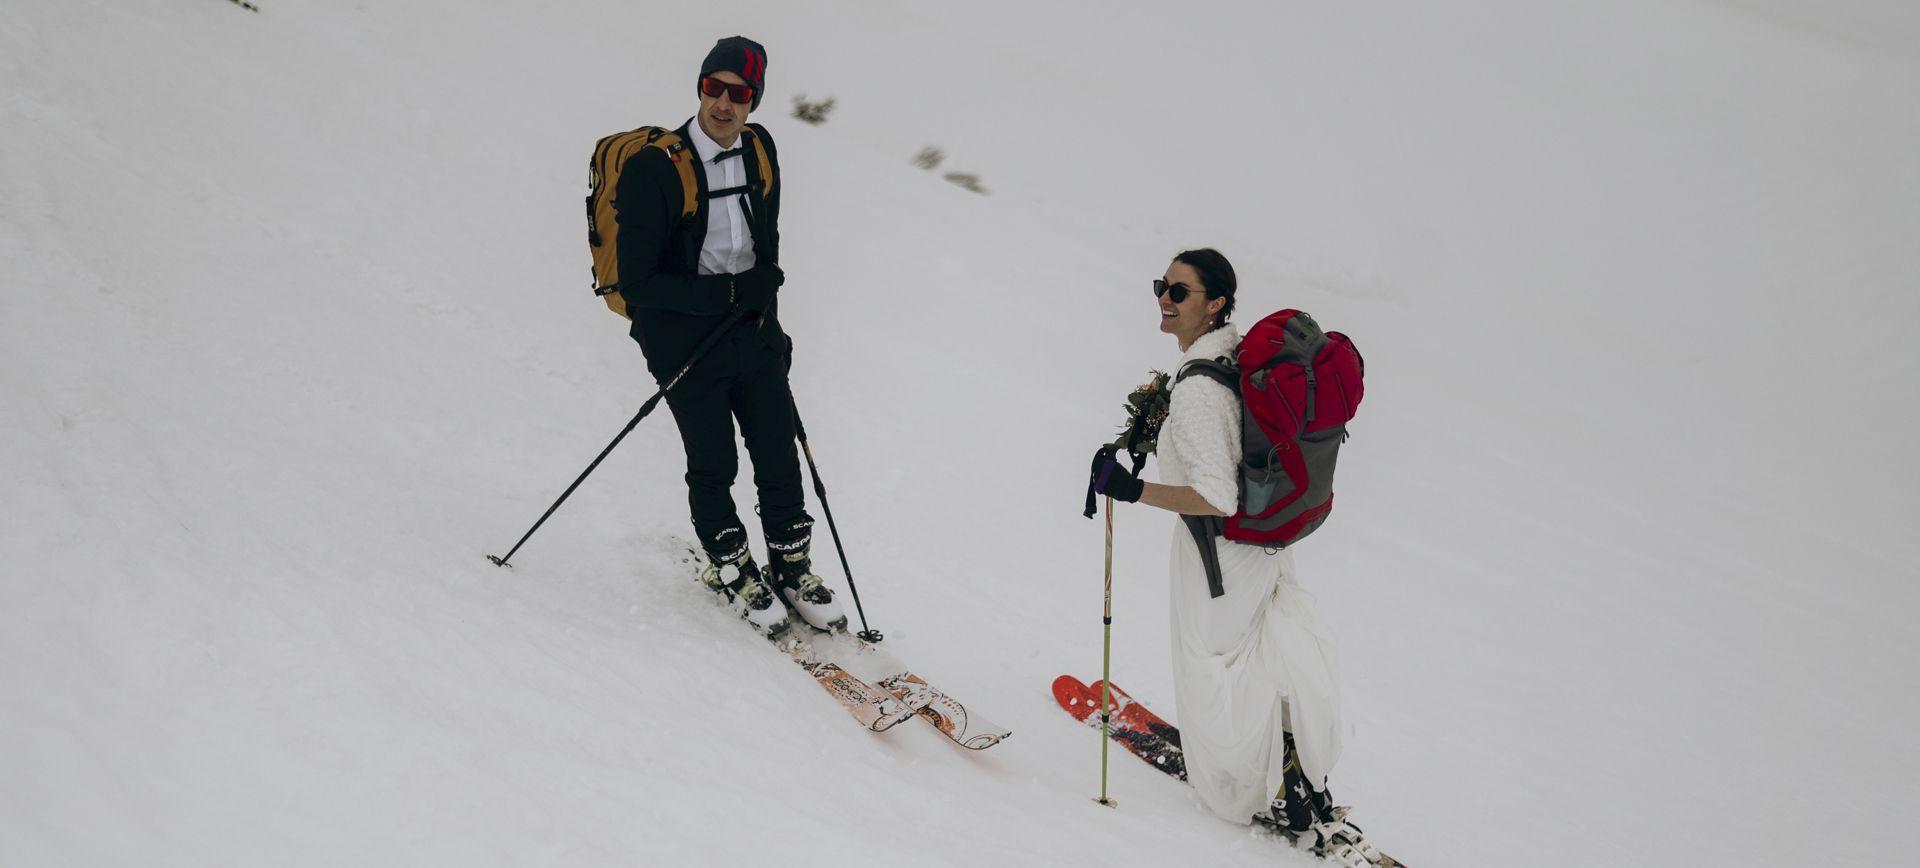 austria winter skiing elopement package